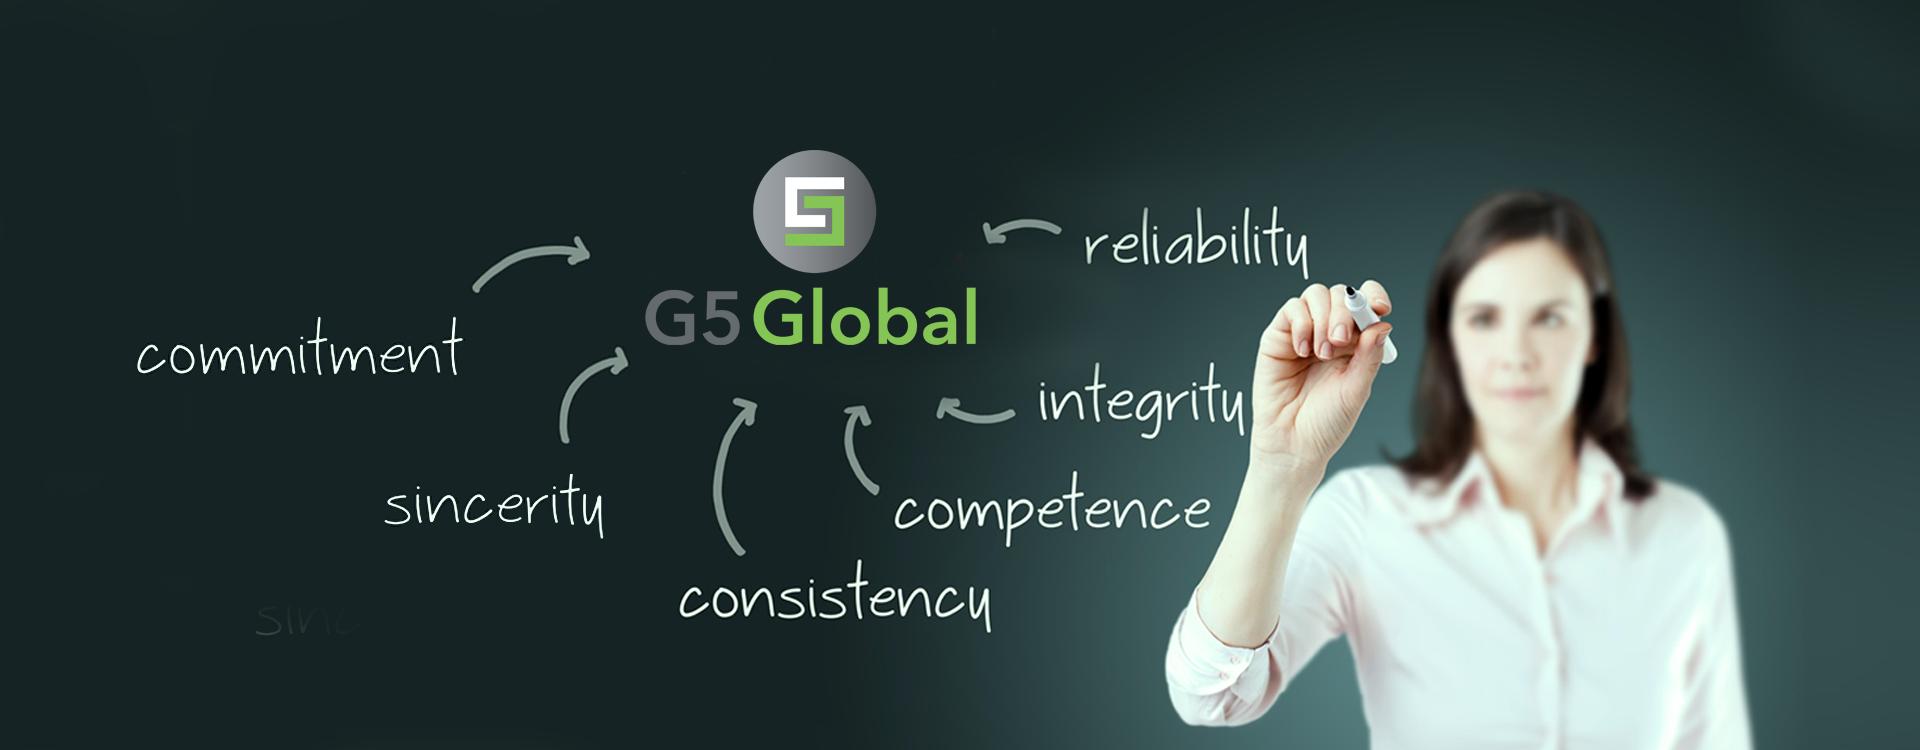 G5-Web-Banner_1920x750px-4-1